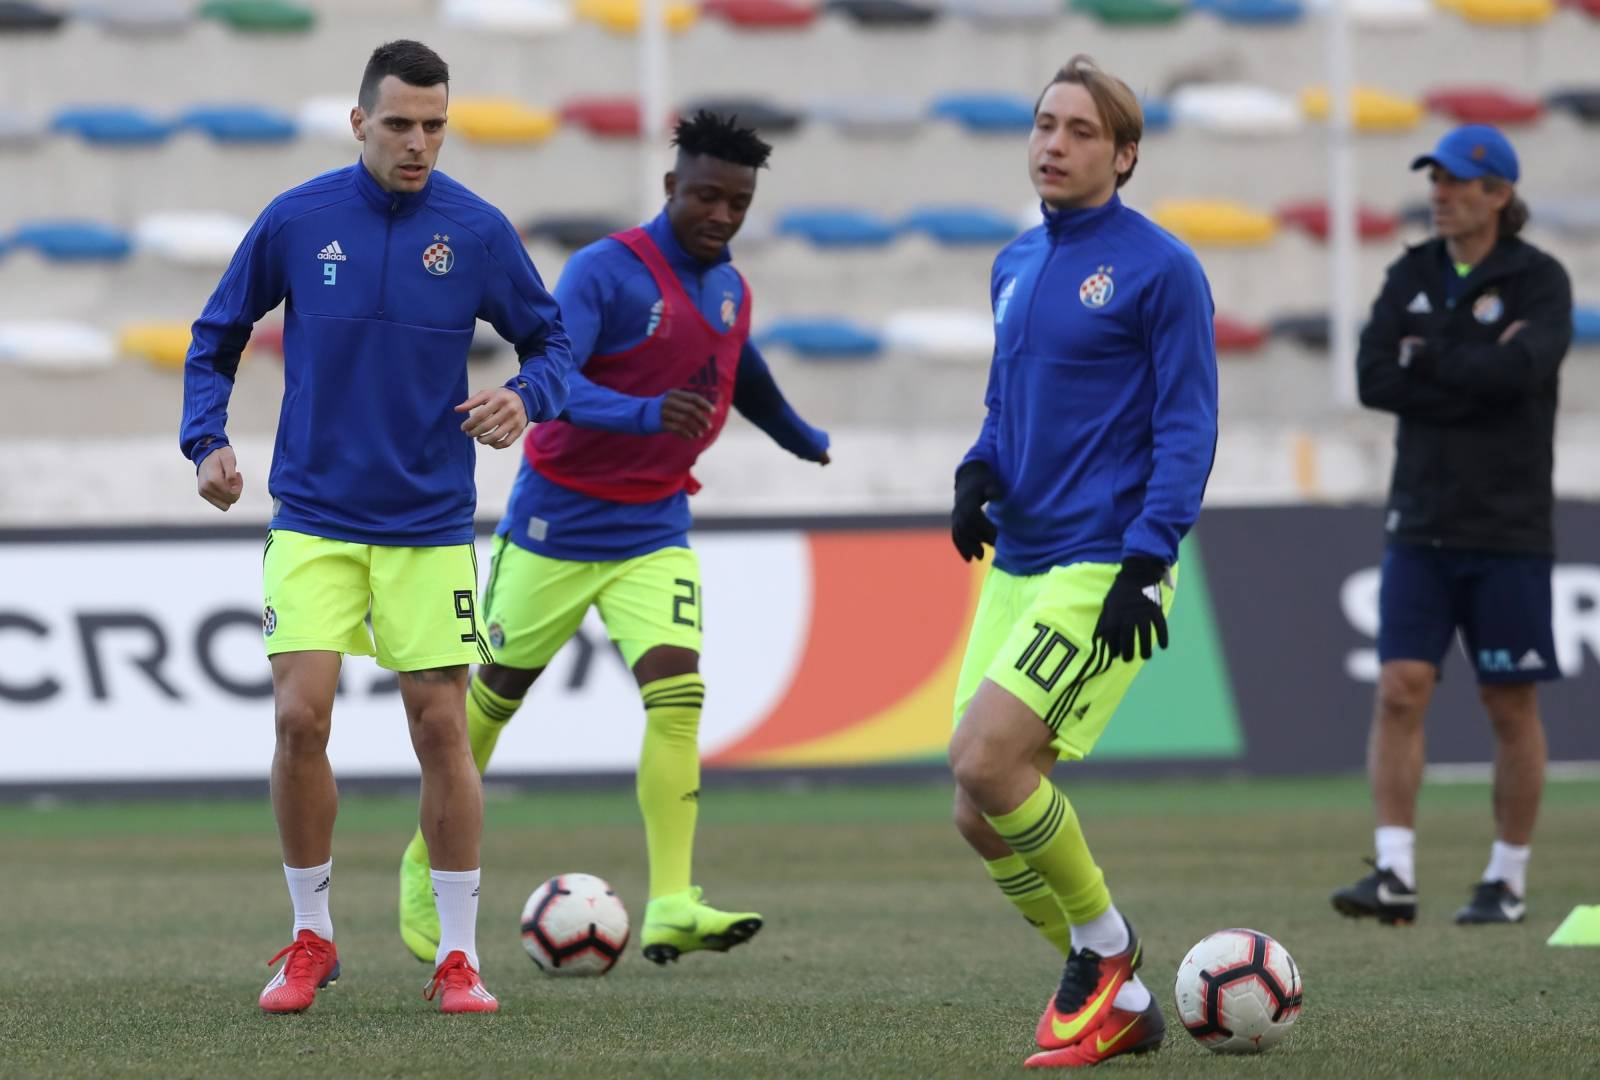 Zagreb: Zagrijavanje igrača GNK Dinamo uoči utakmice s Lokomotivom